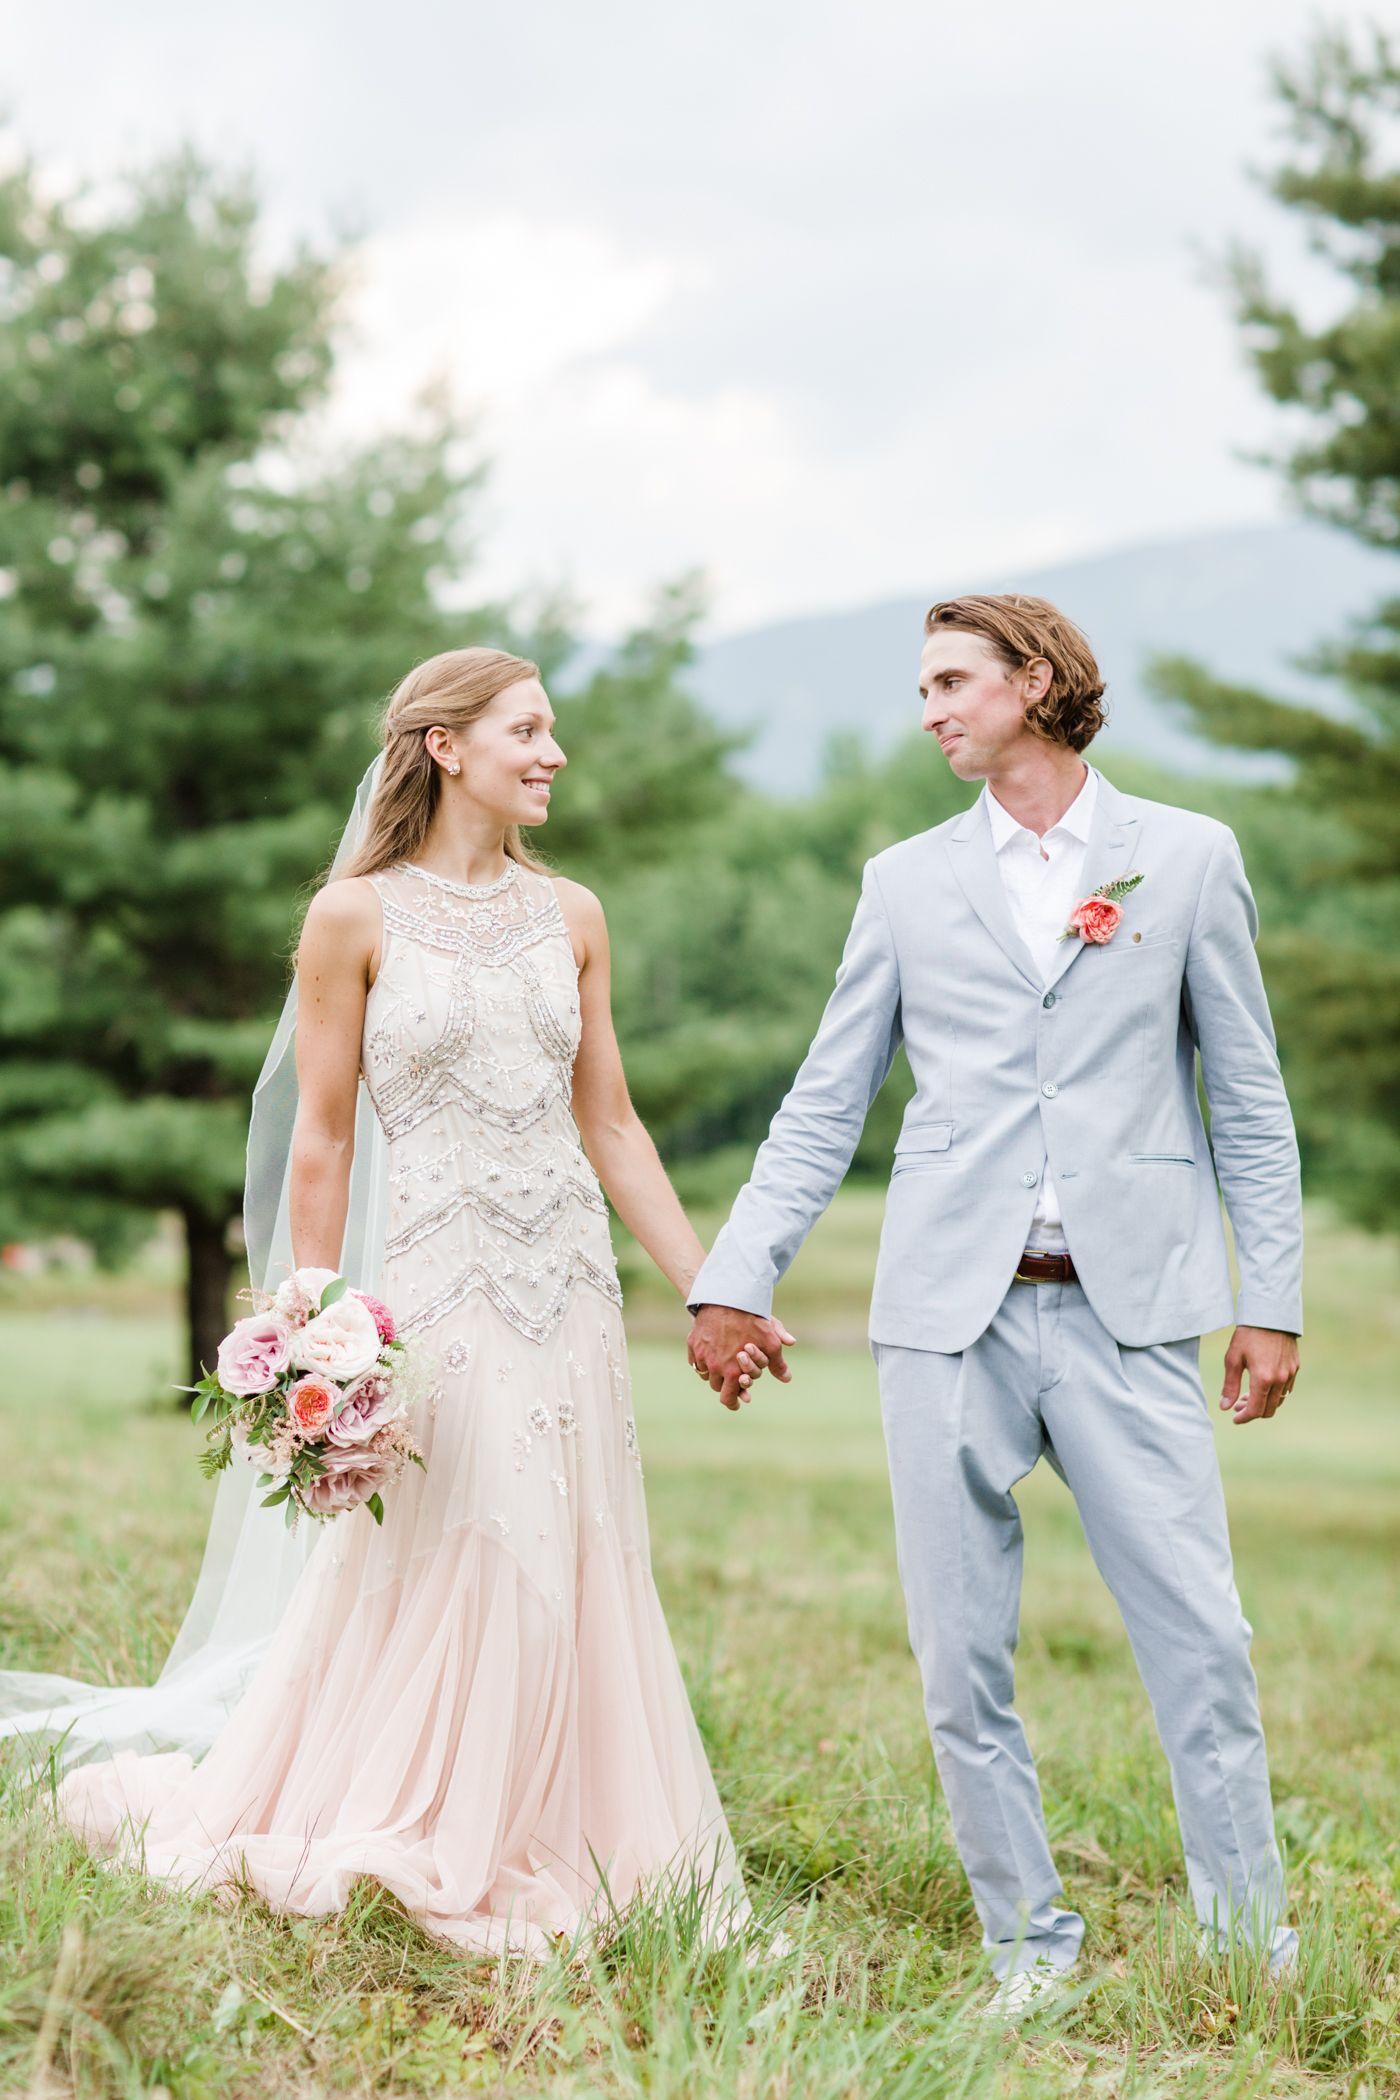 Outdoor summer wedding dresses  Lis u Pearson Vermont Summer Rose On The Dance Floor Wedding